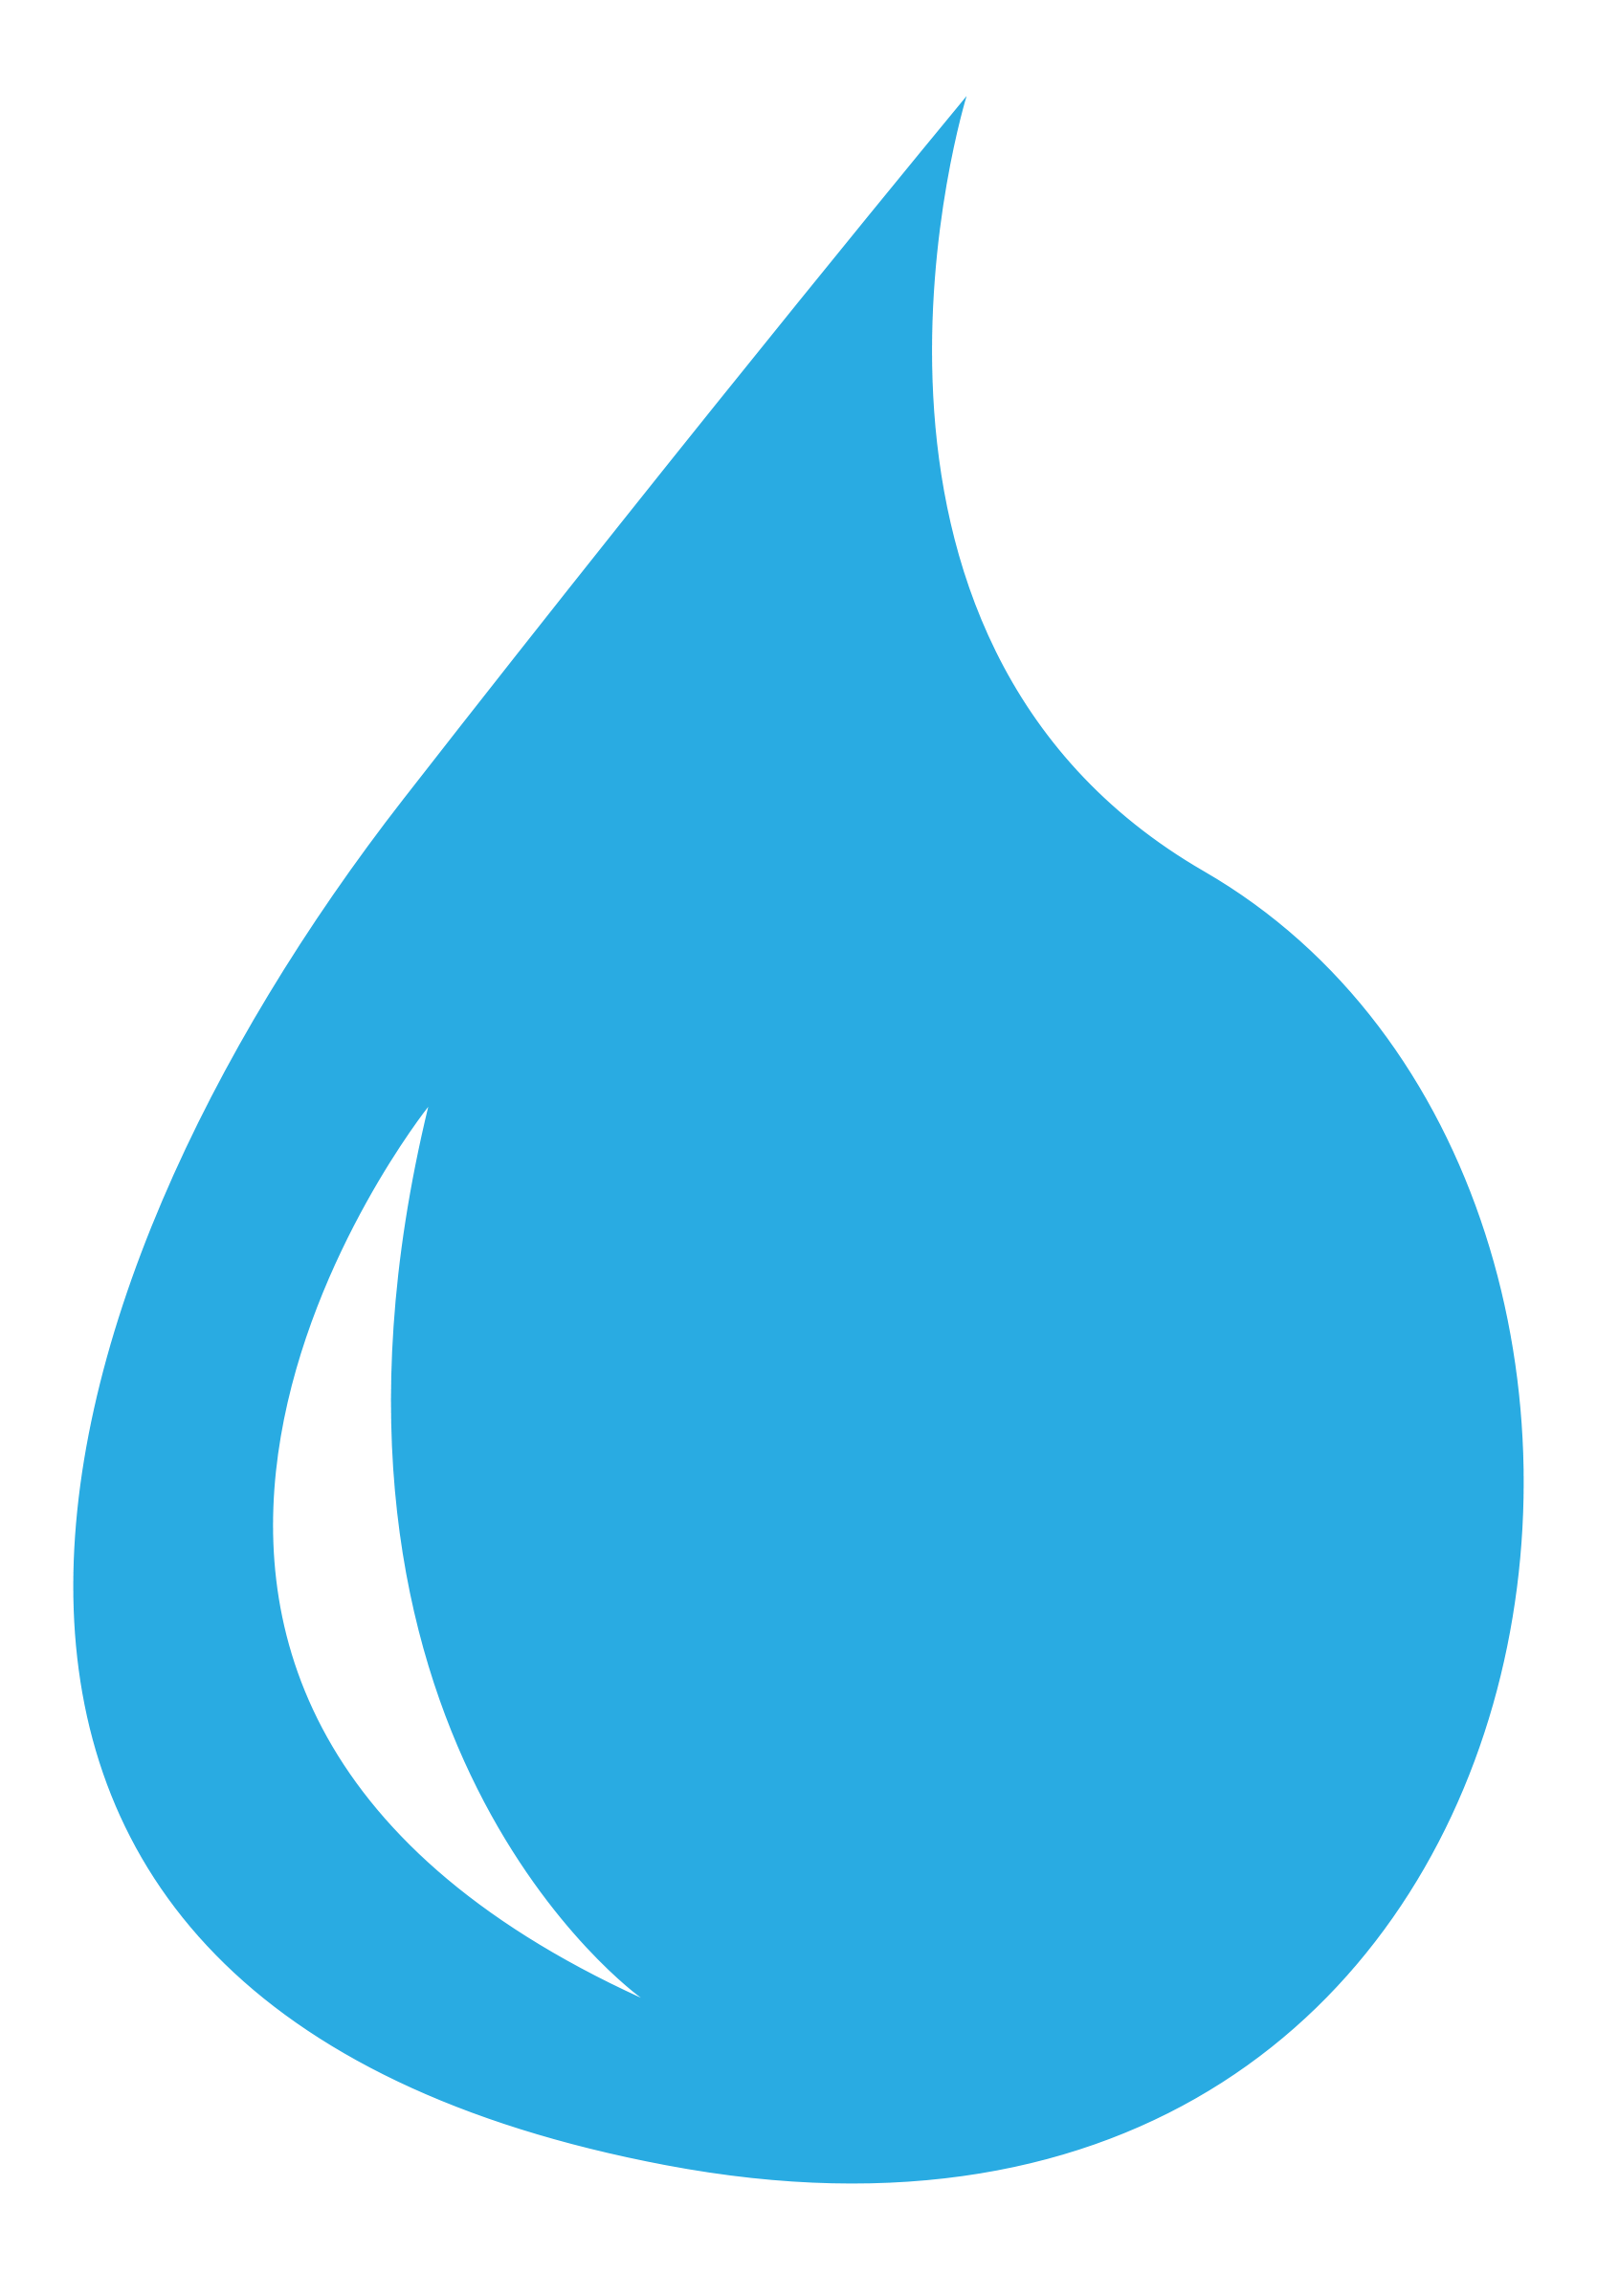 1669x2400 Water Drop Droplet Clipart Kid